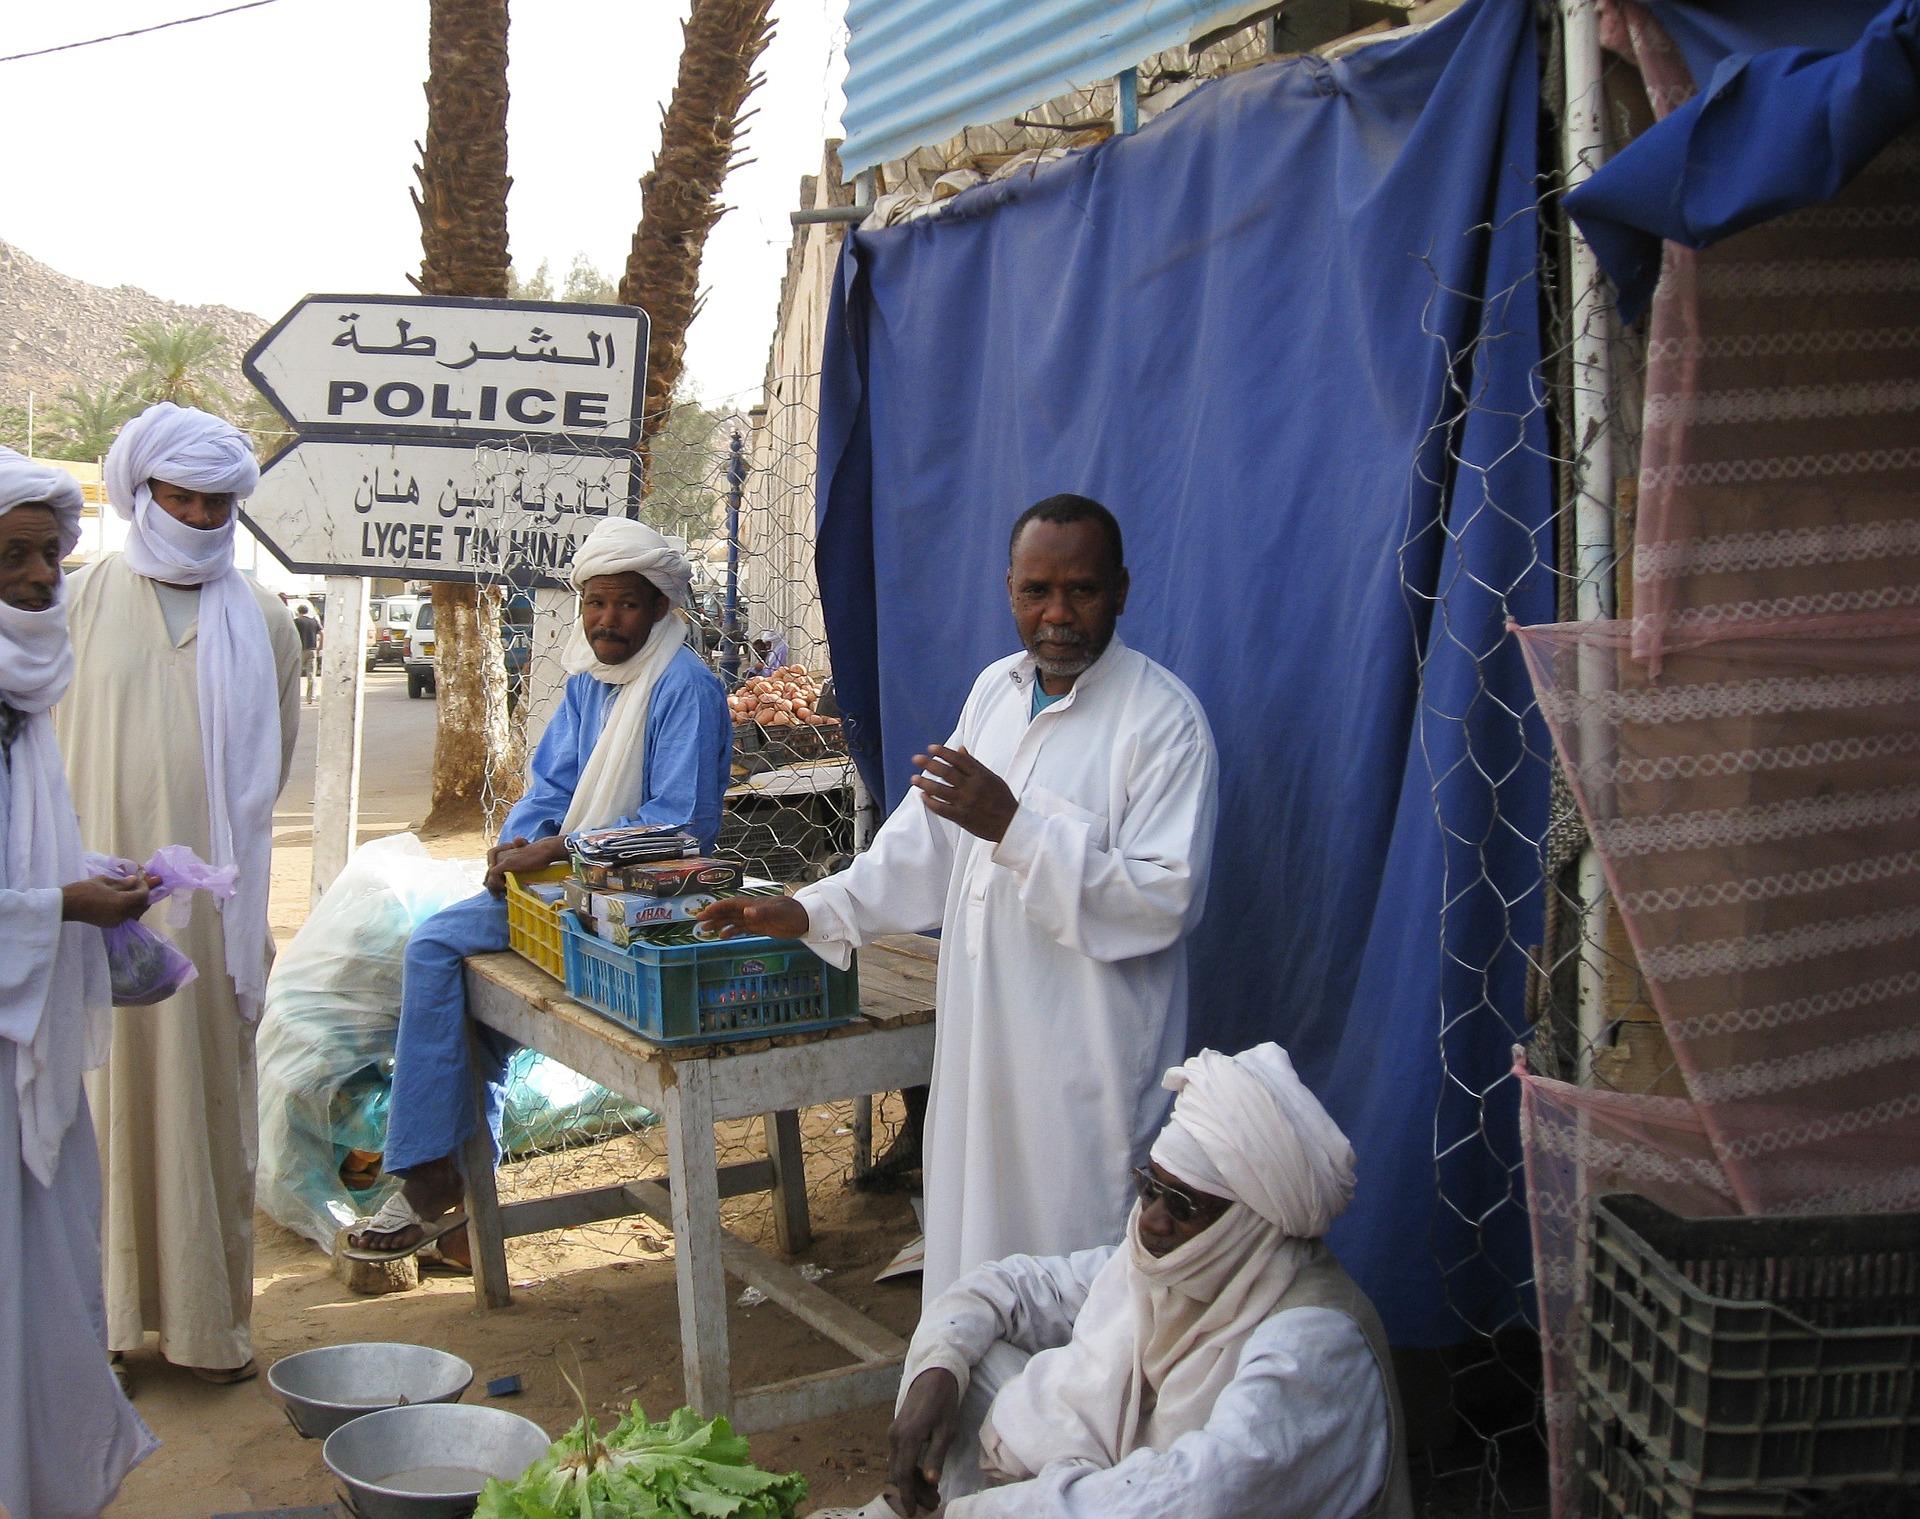 Mercado tuareg en Argelia. Foto: jackmac34.